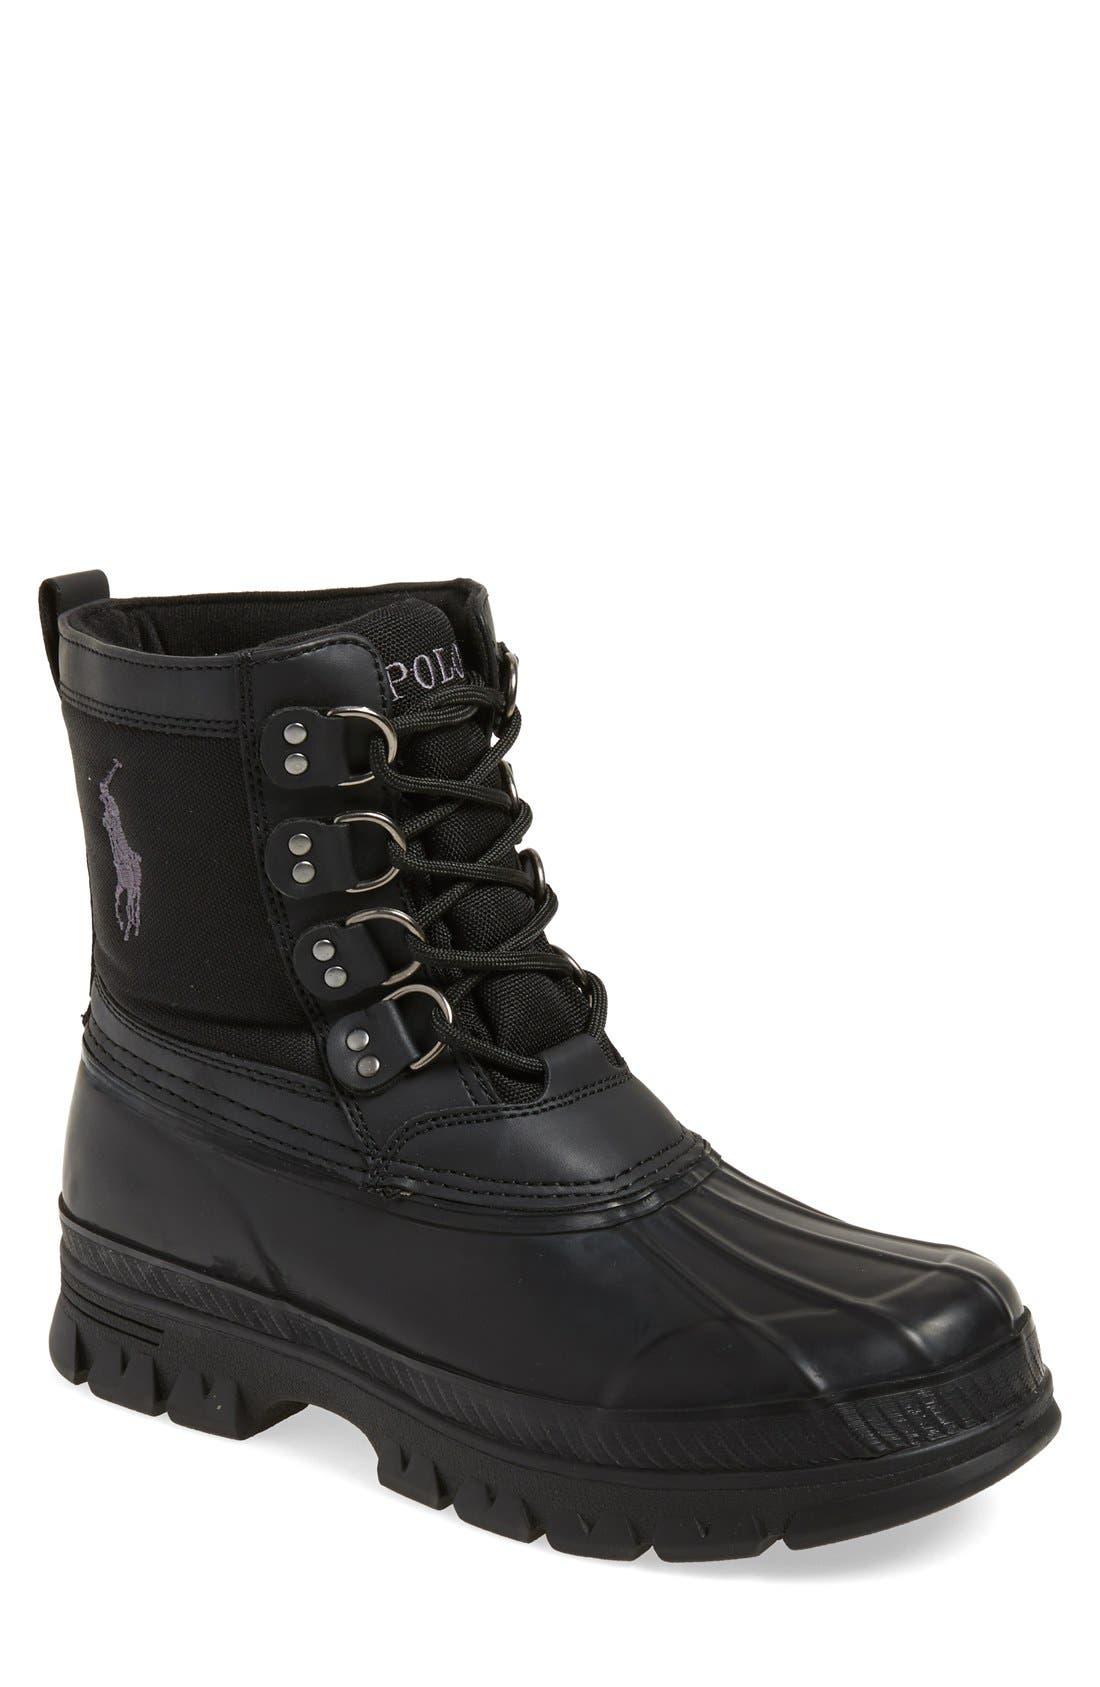 POLO RALPH LAUREN 'Crestwick' Tall Boot, Main, color, 001